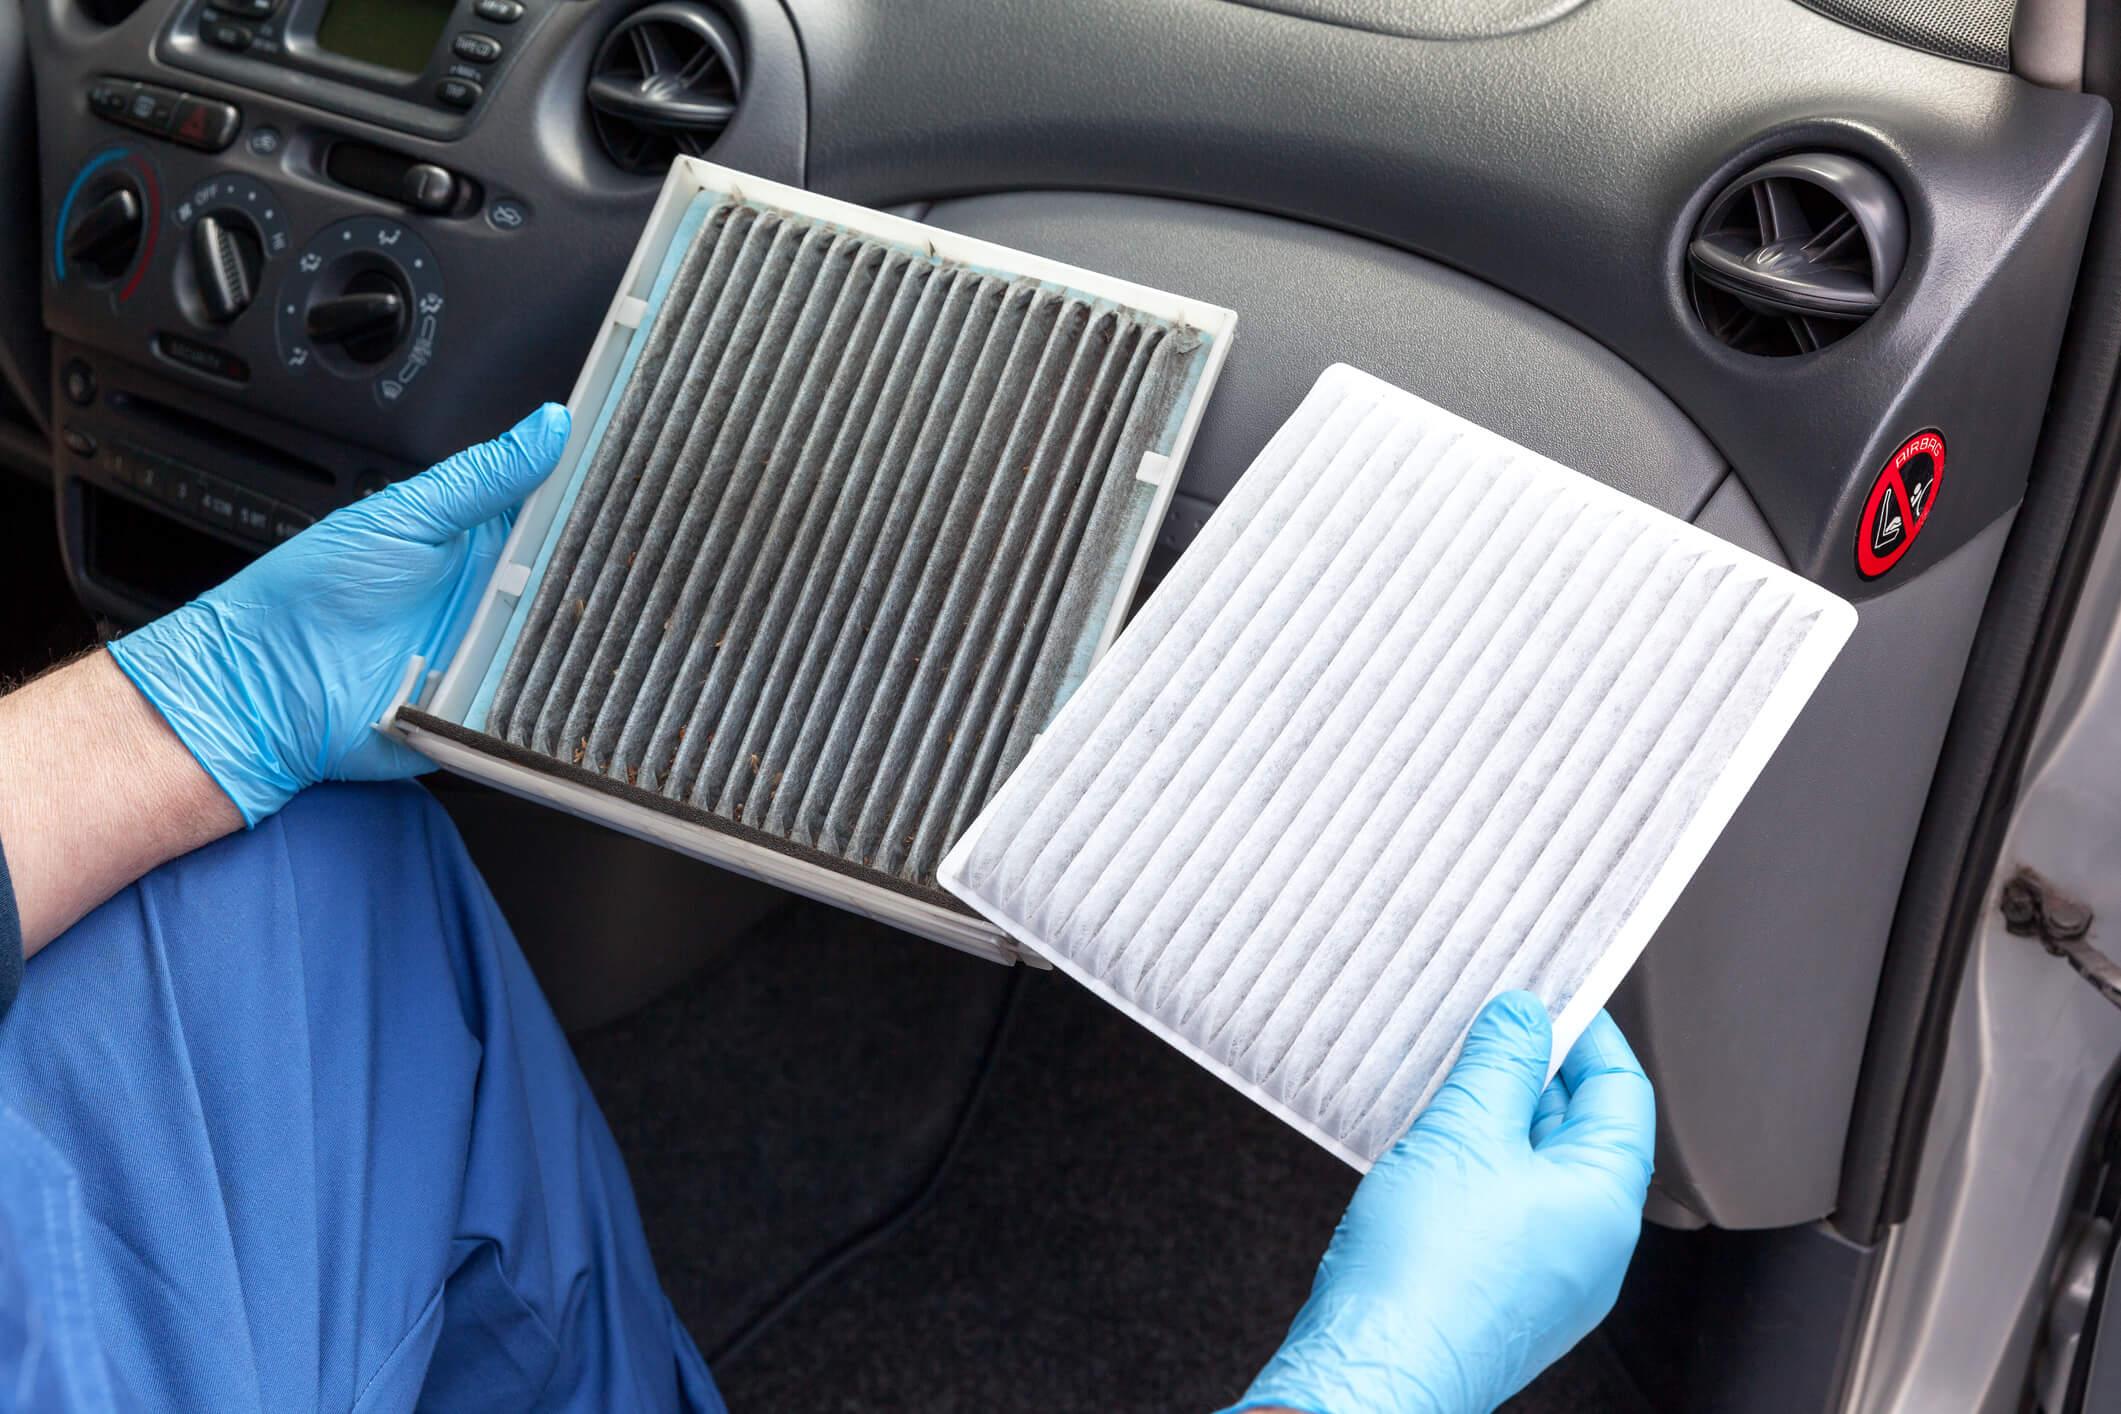 Filtro de ar-condicionado sujo e limpo